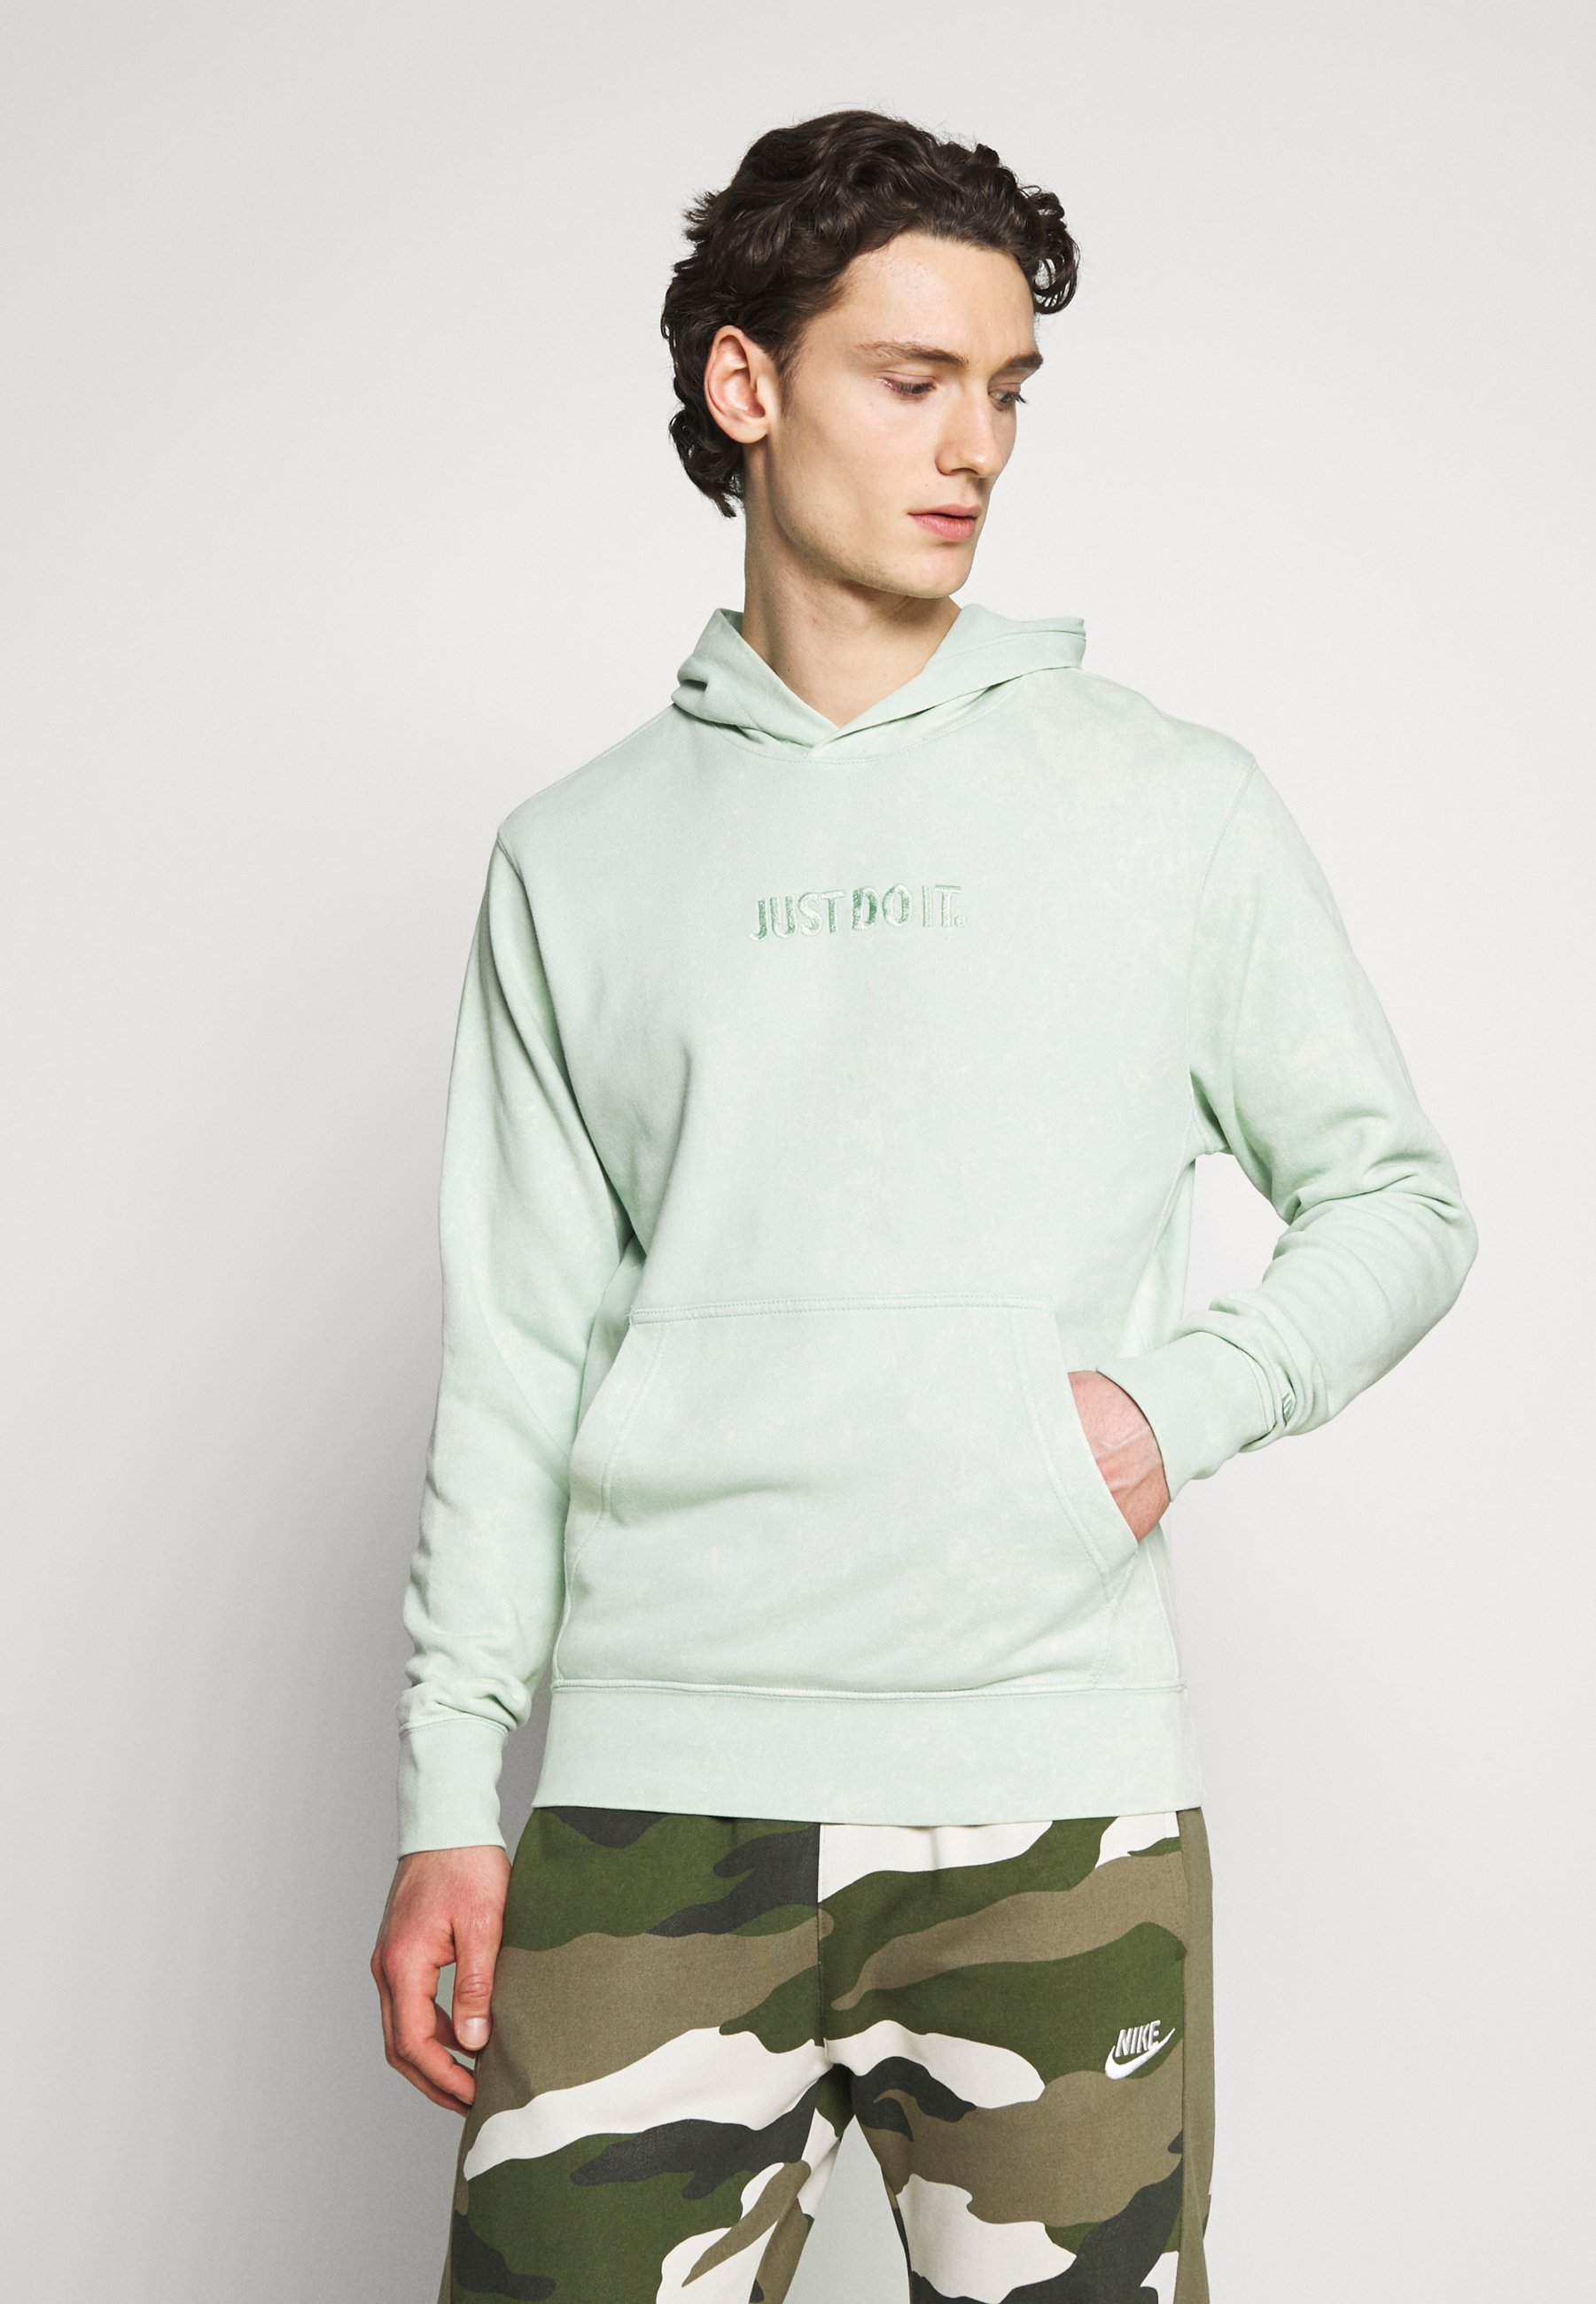 Fashion Style Explore Men's Clothing Nike Sportswear HOODIE WASH Hoodie pistachio frost UPLAi9ju8 dxcYJCbmz